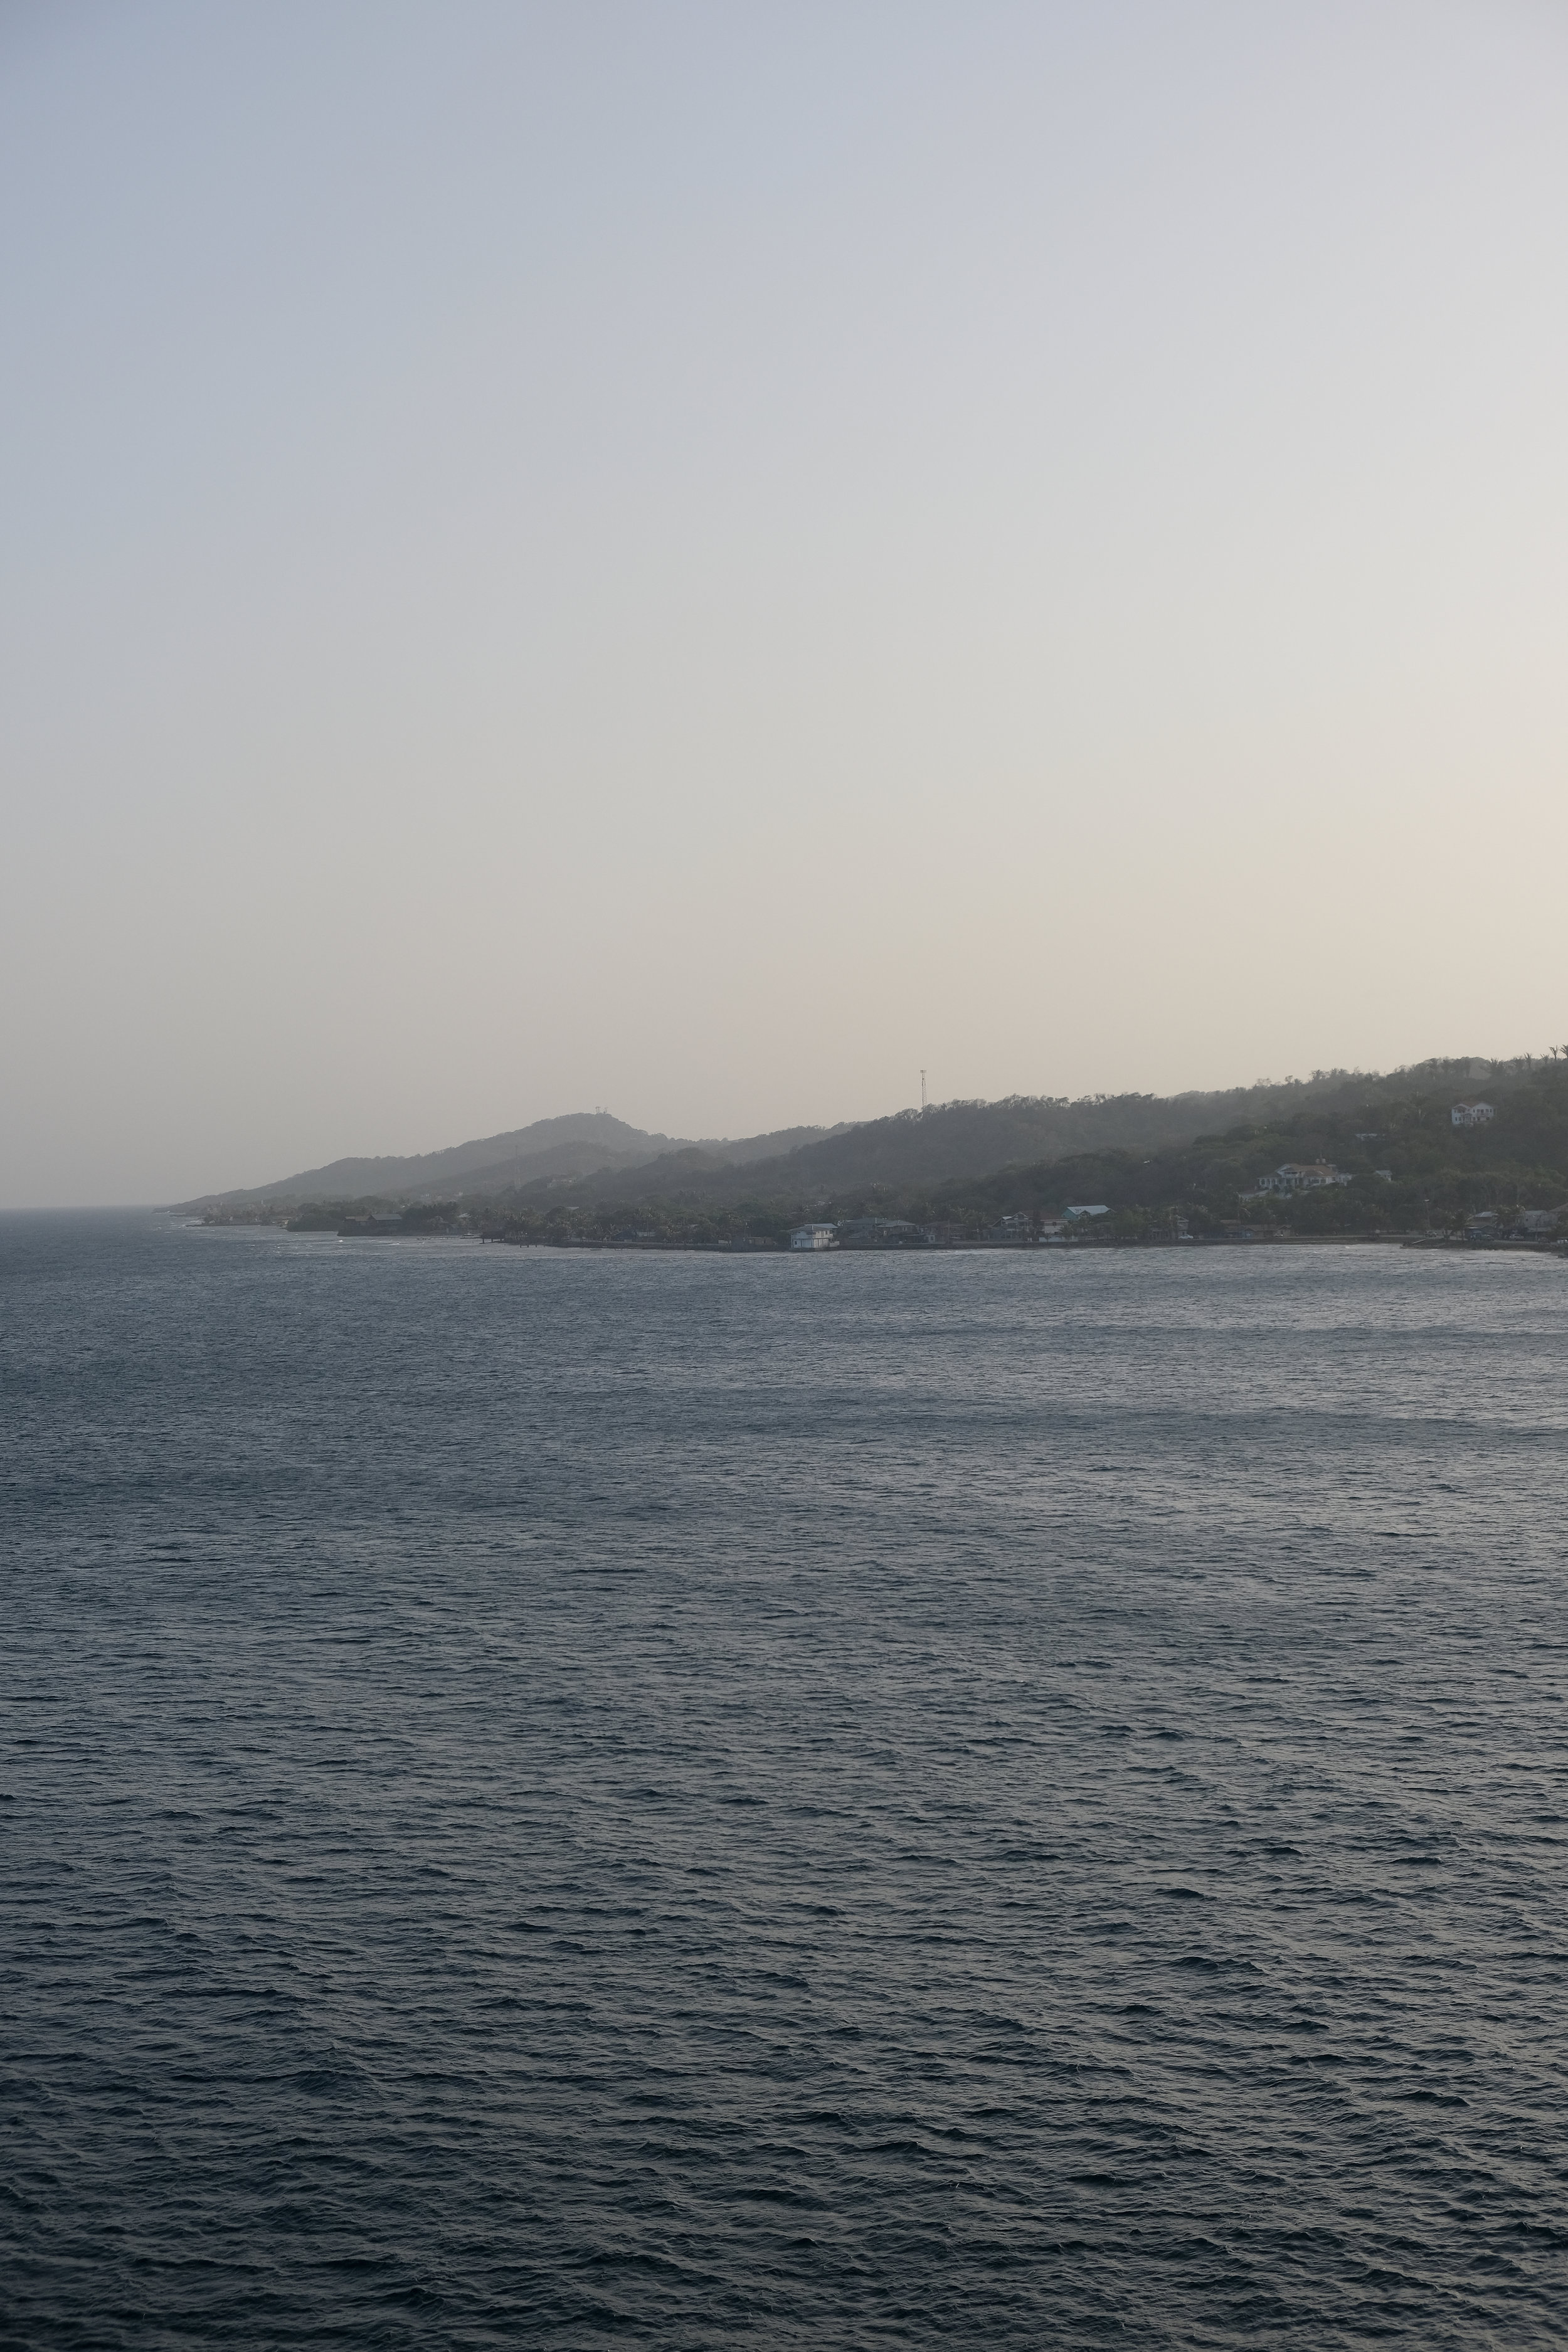 island-9110.jpg